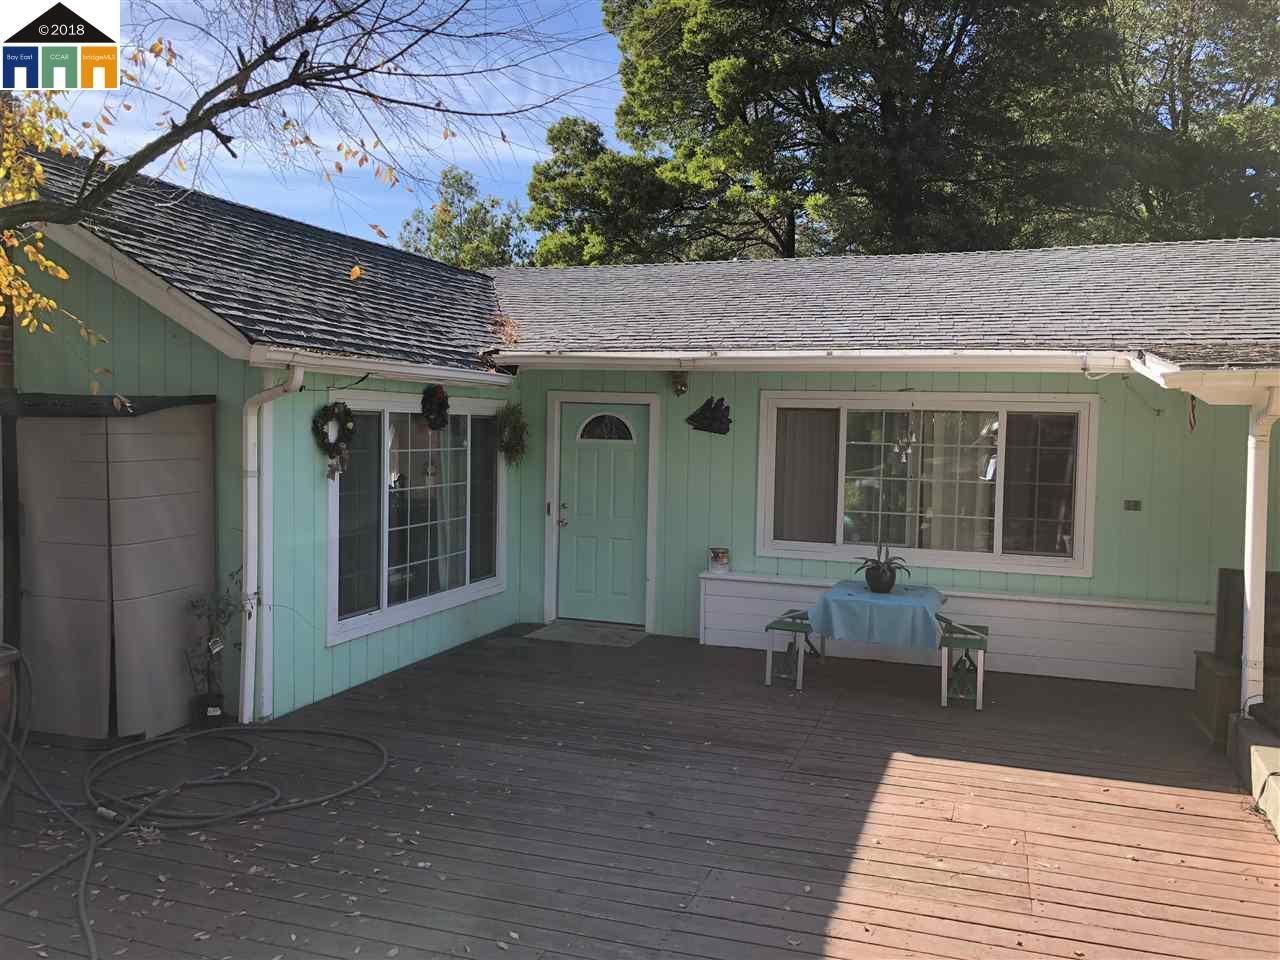 Single Family Home for Sale at 635 La Paloma Road 635 La Paloma Road El Sobrante, California 94803 United States